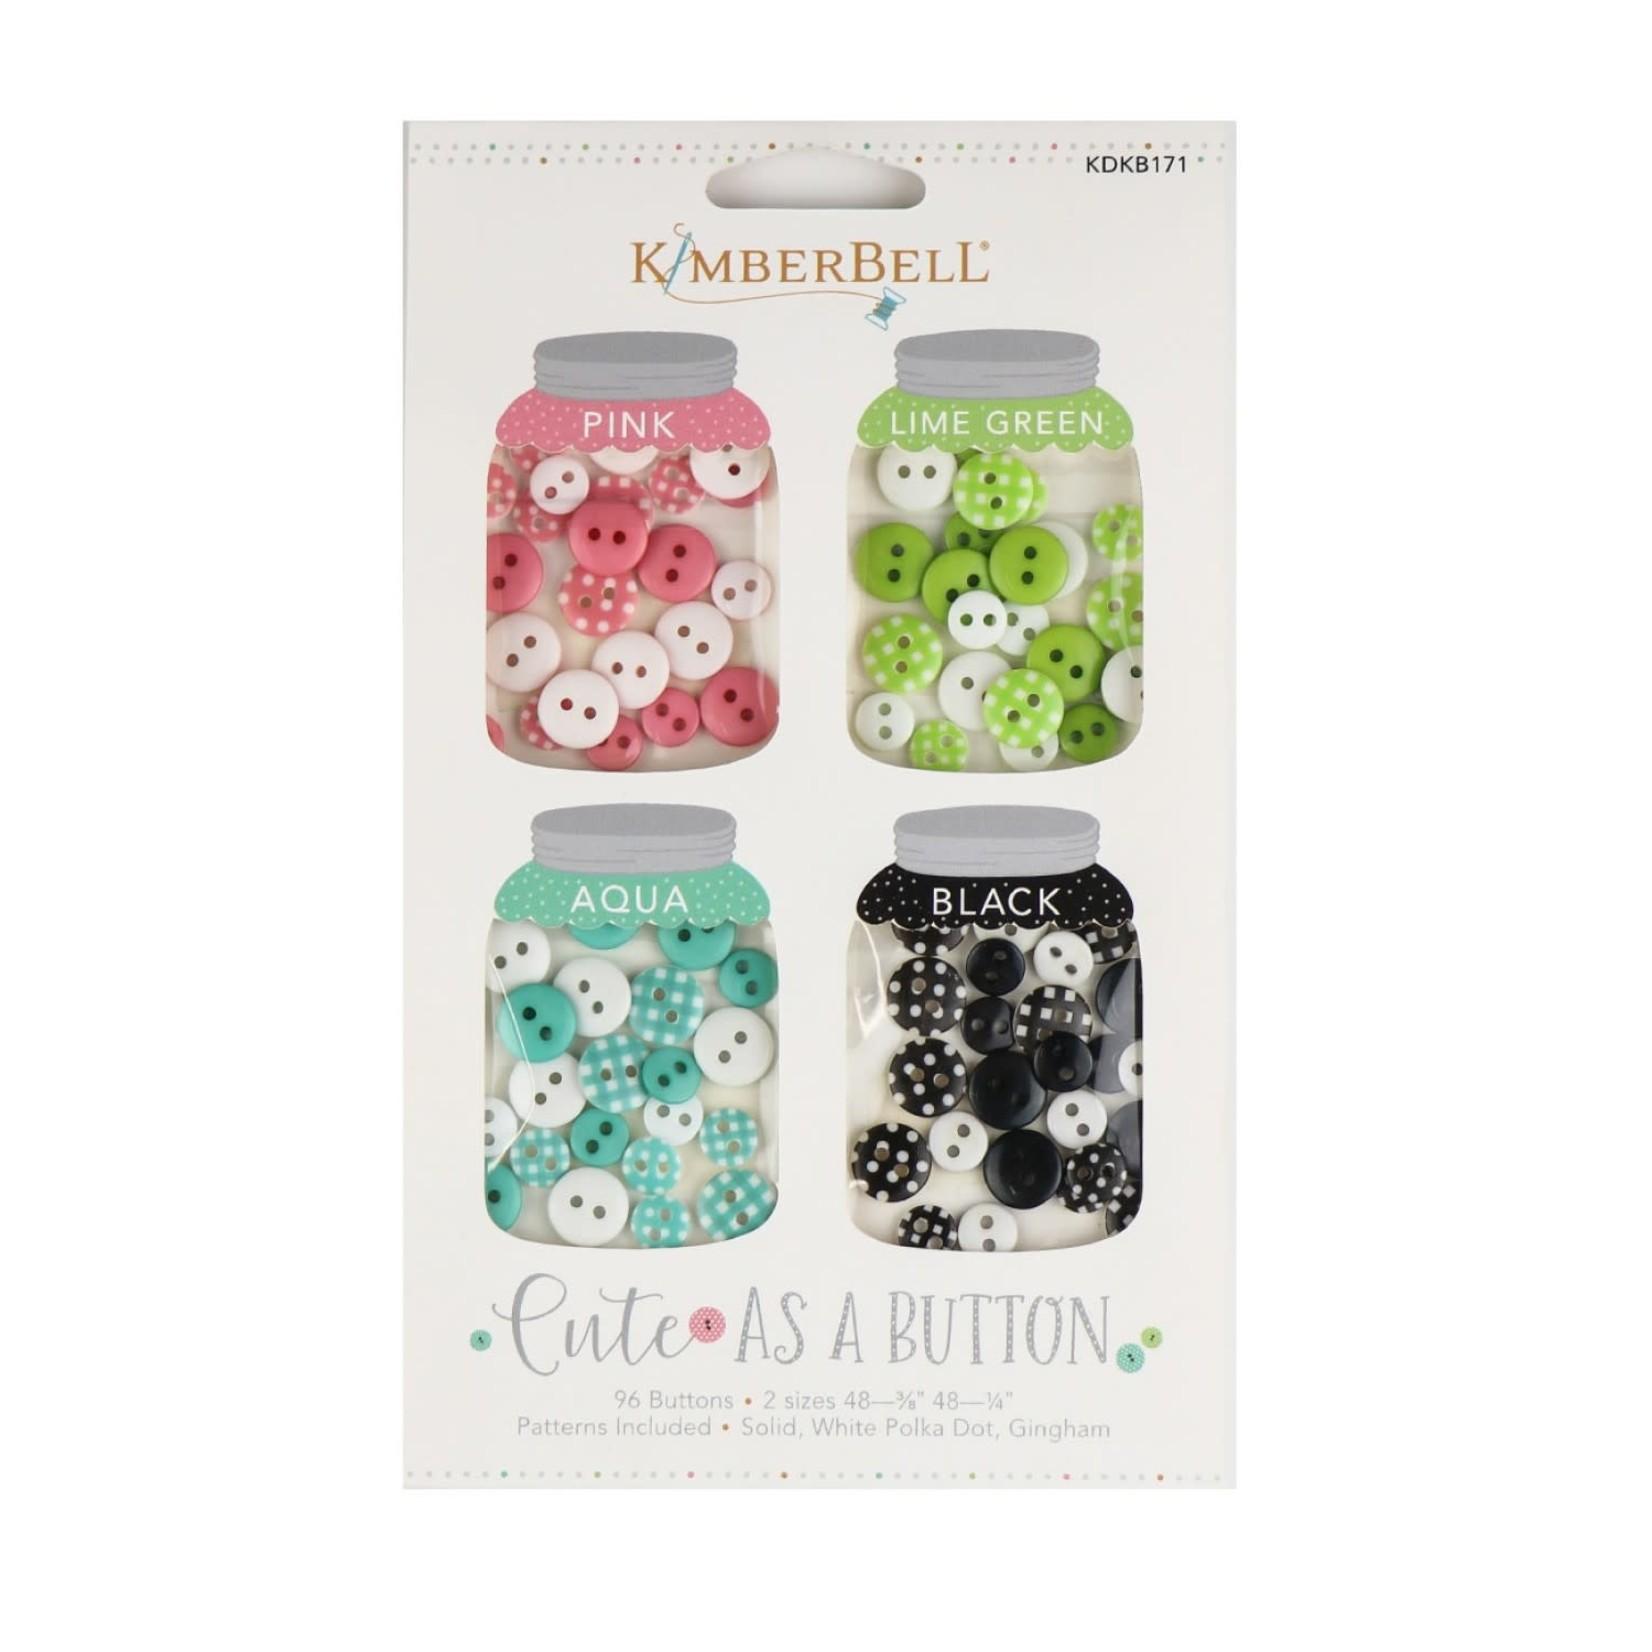 KIMBERBELL DESIGNS Cute As A Button - Pink, Lime Green, Aqua, Black